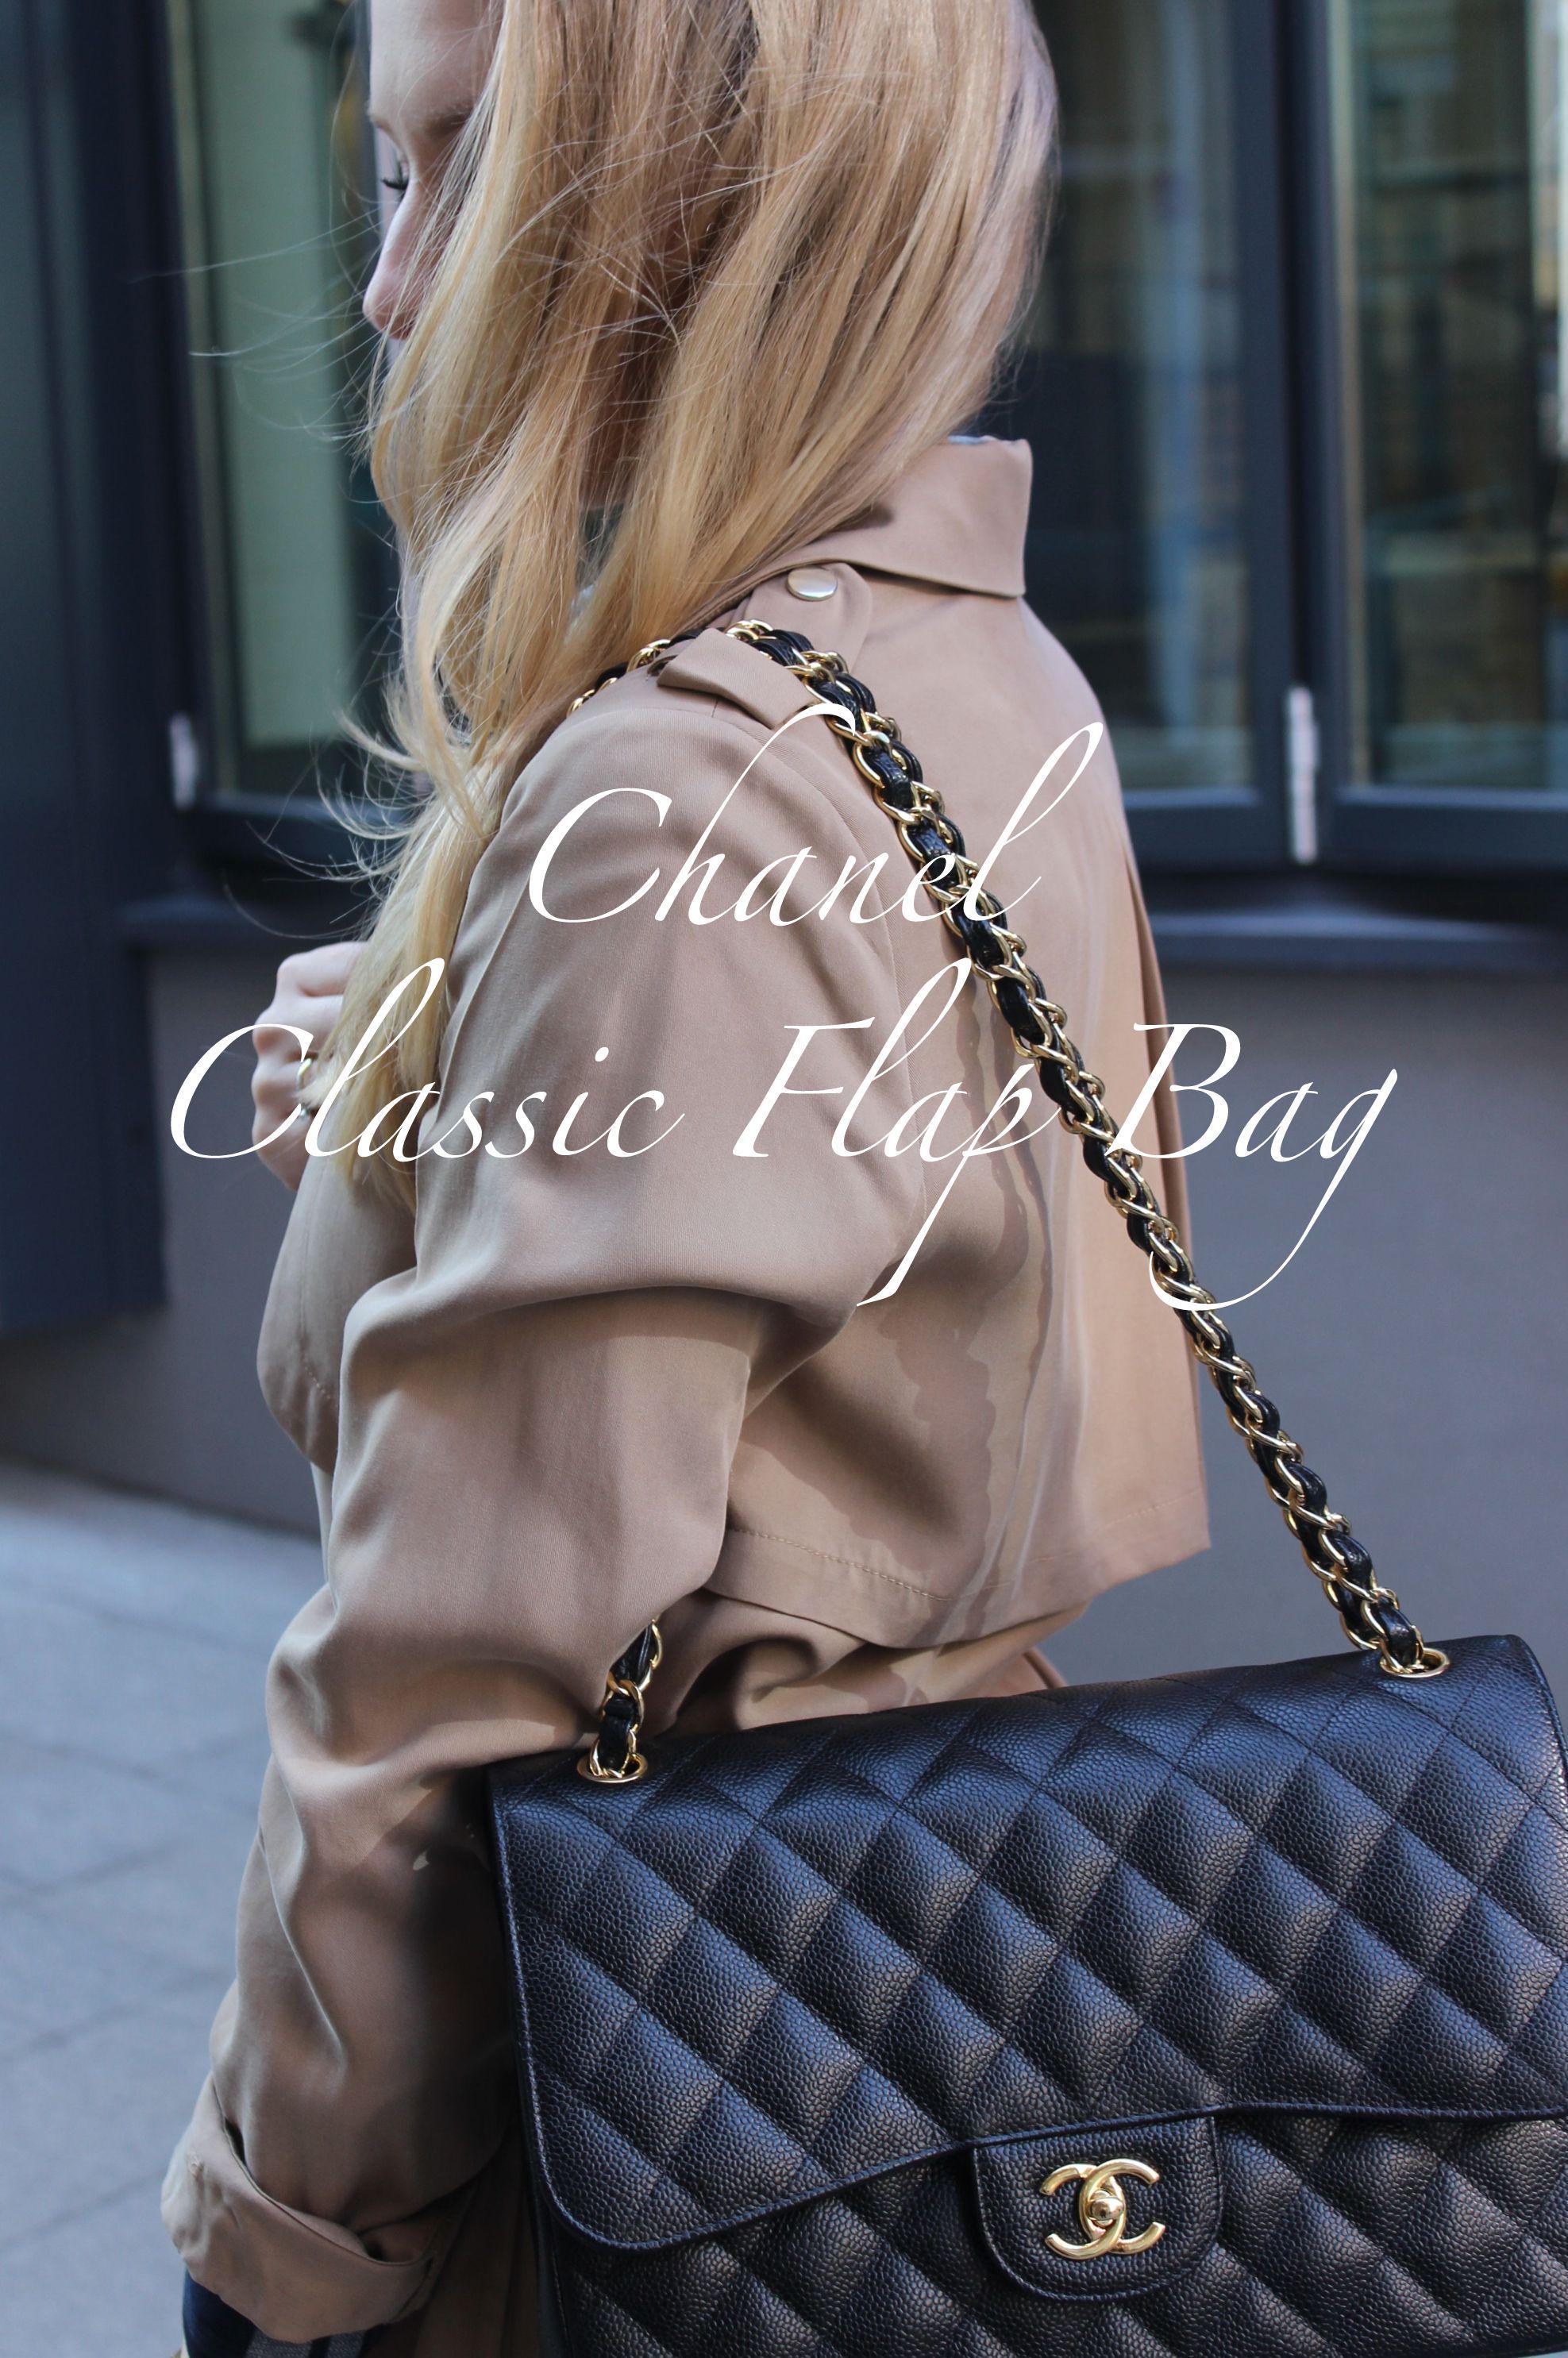 TOP 16 - Chanel Classic Flap Bag 2